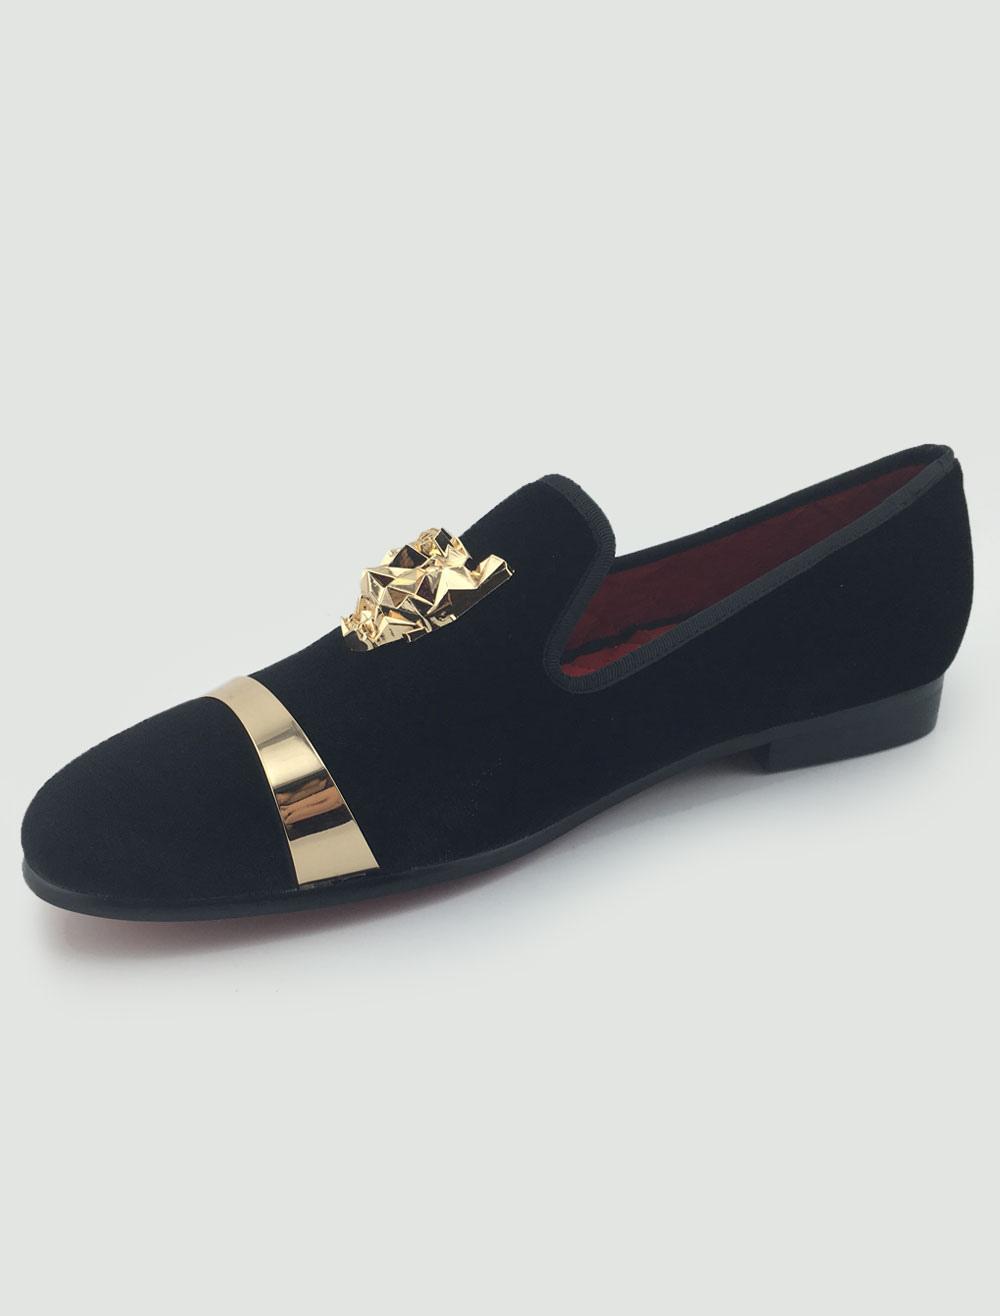 Black Men Loafers 2018 Flannel Round Toe Metal Detail Slip On Shoes